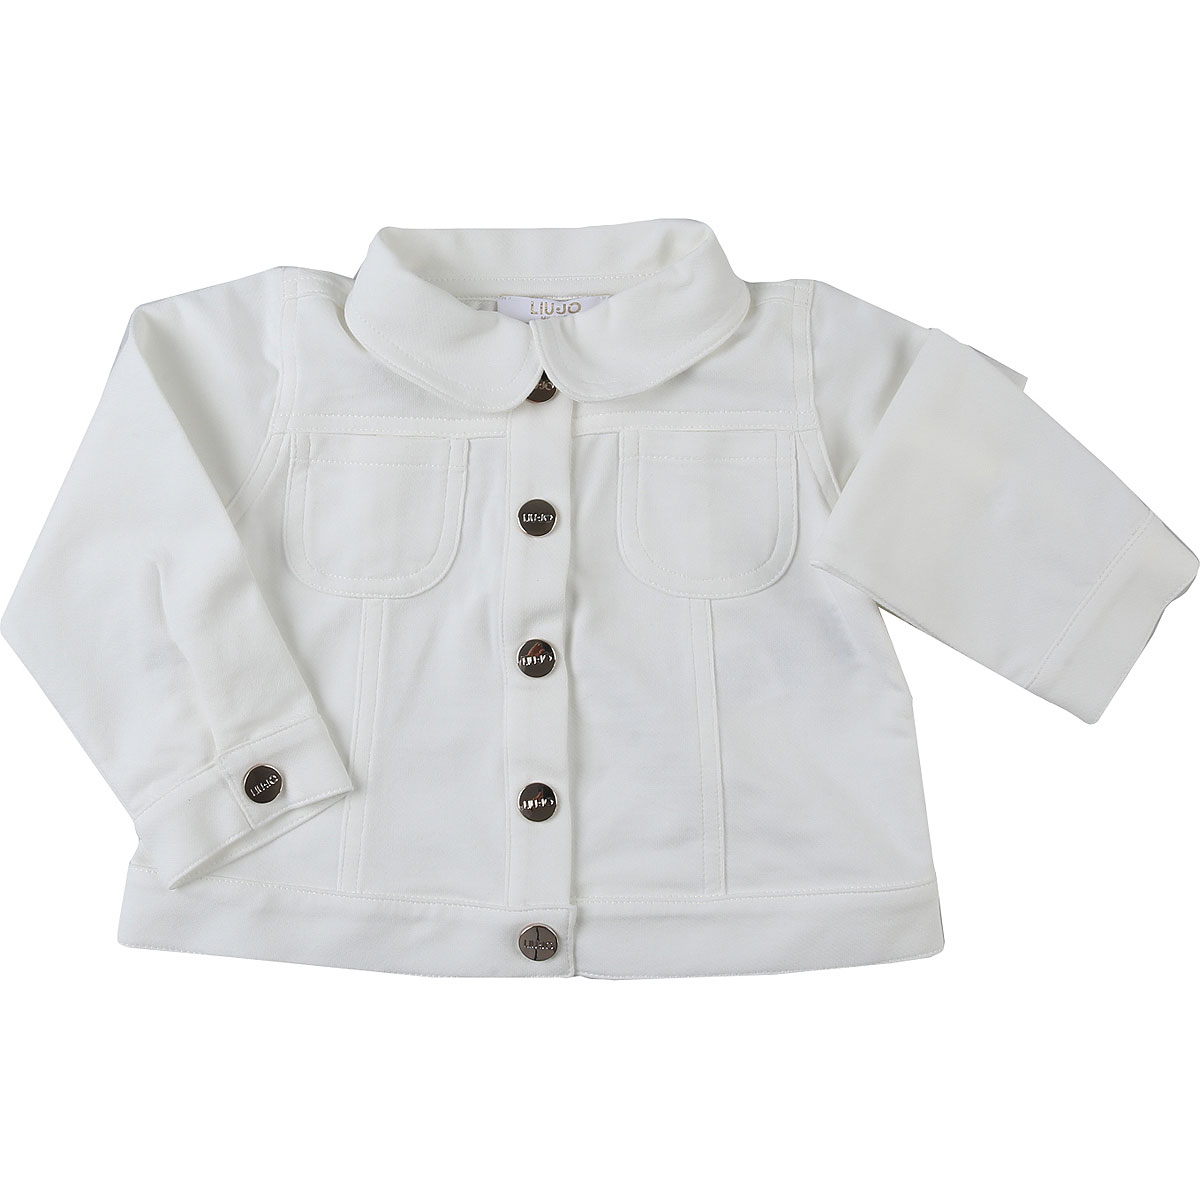 Liu Jo Baby Jacket for Girls On Sale, White, Cotton, 2019, 12M 18M 3M 6M